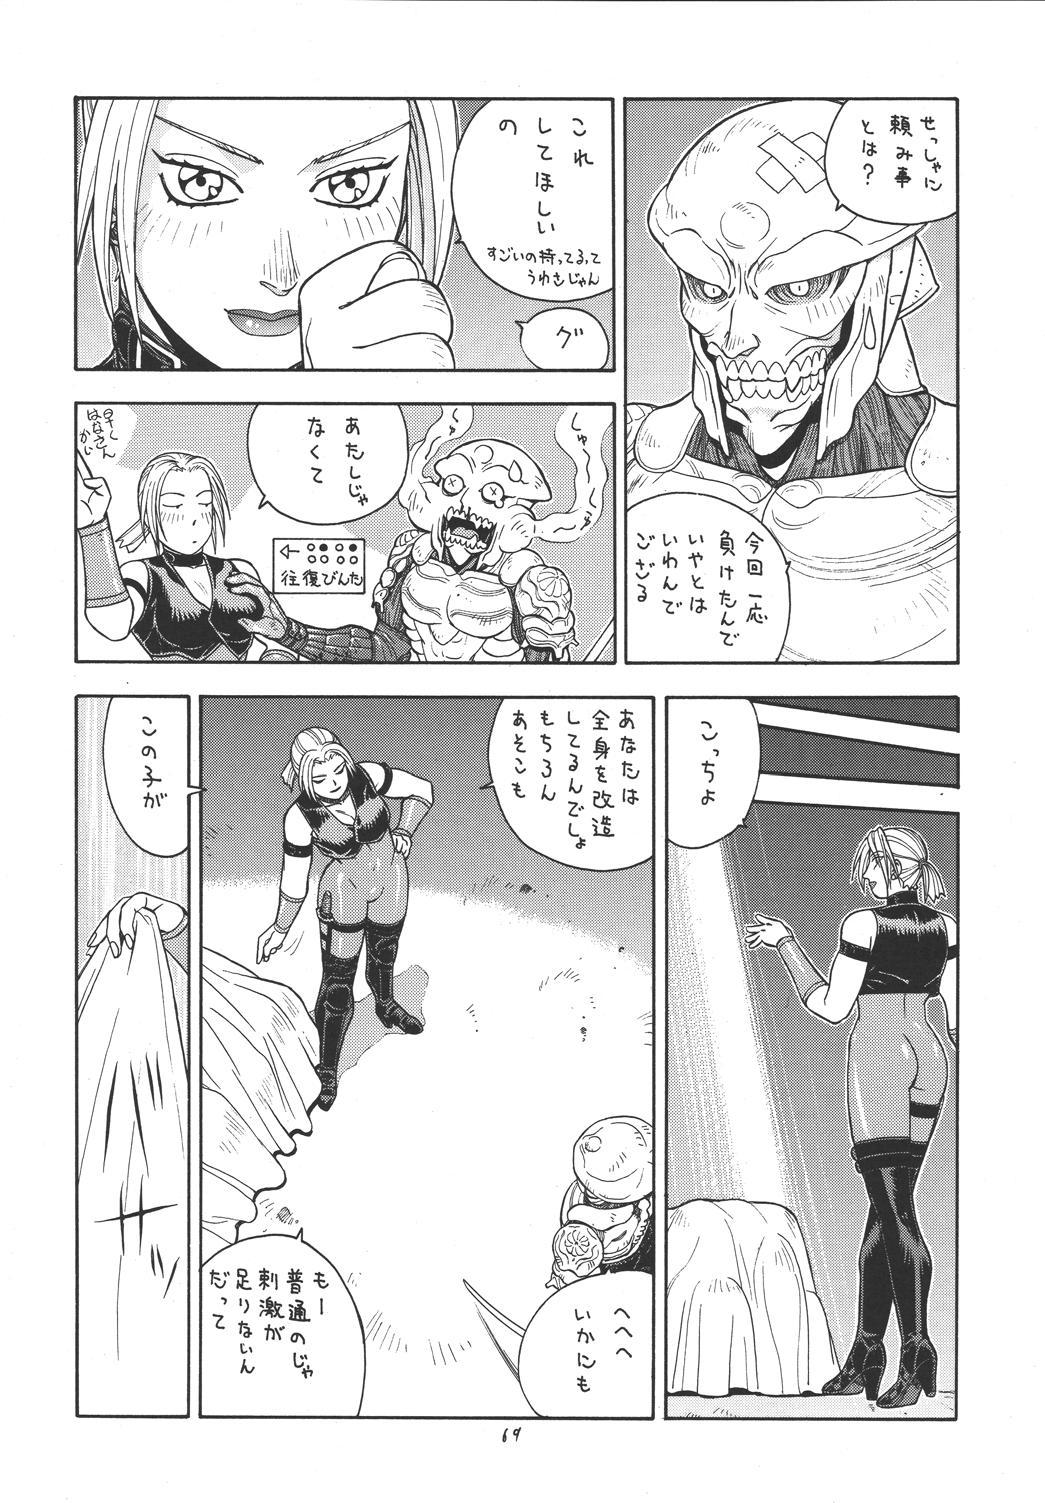 Fighters Giga Comics Round 1 67